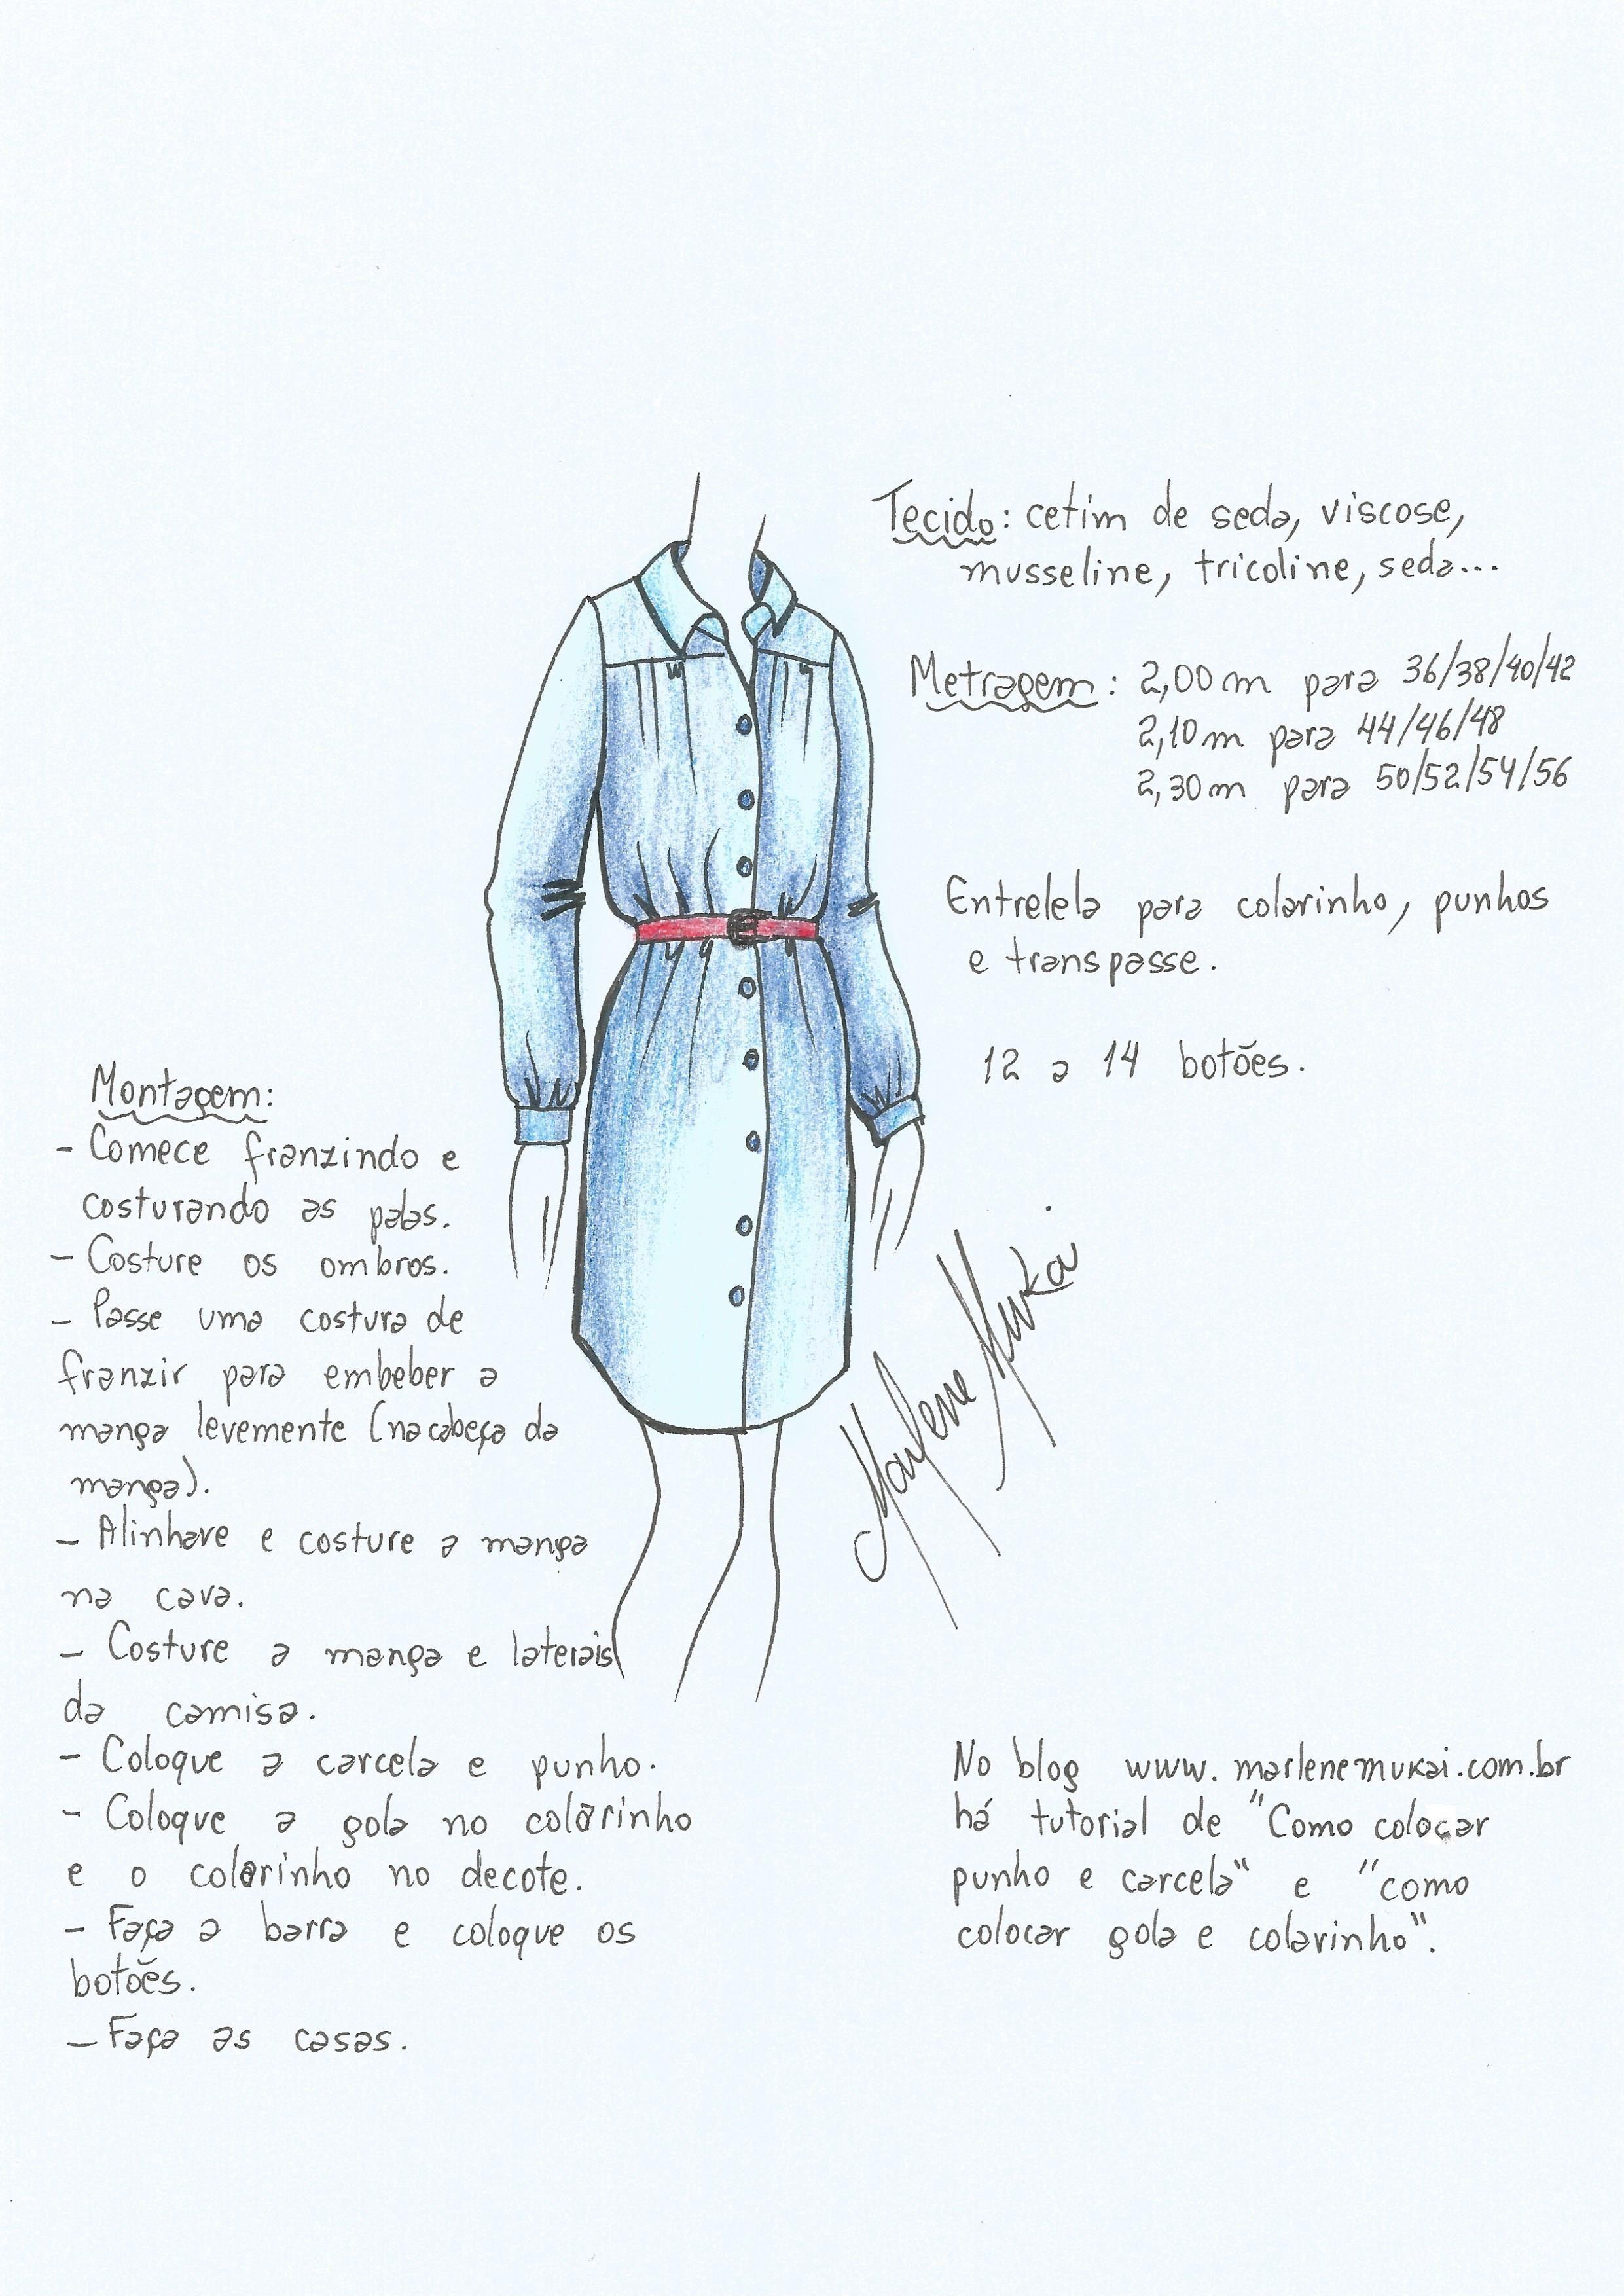 Pin de Olinta Silveira De Oliveira Mesquita em Modelos | Pinterest ...